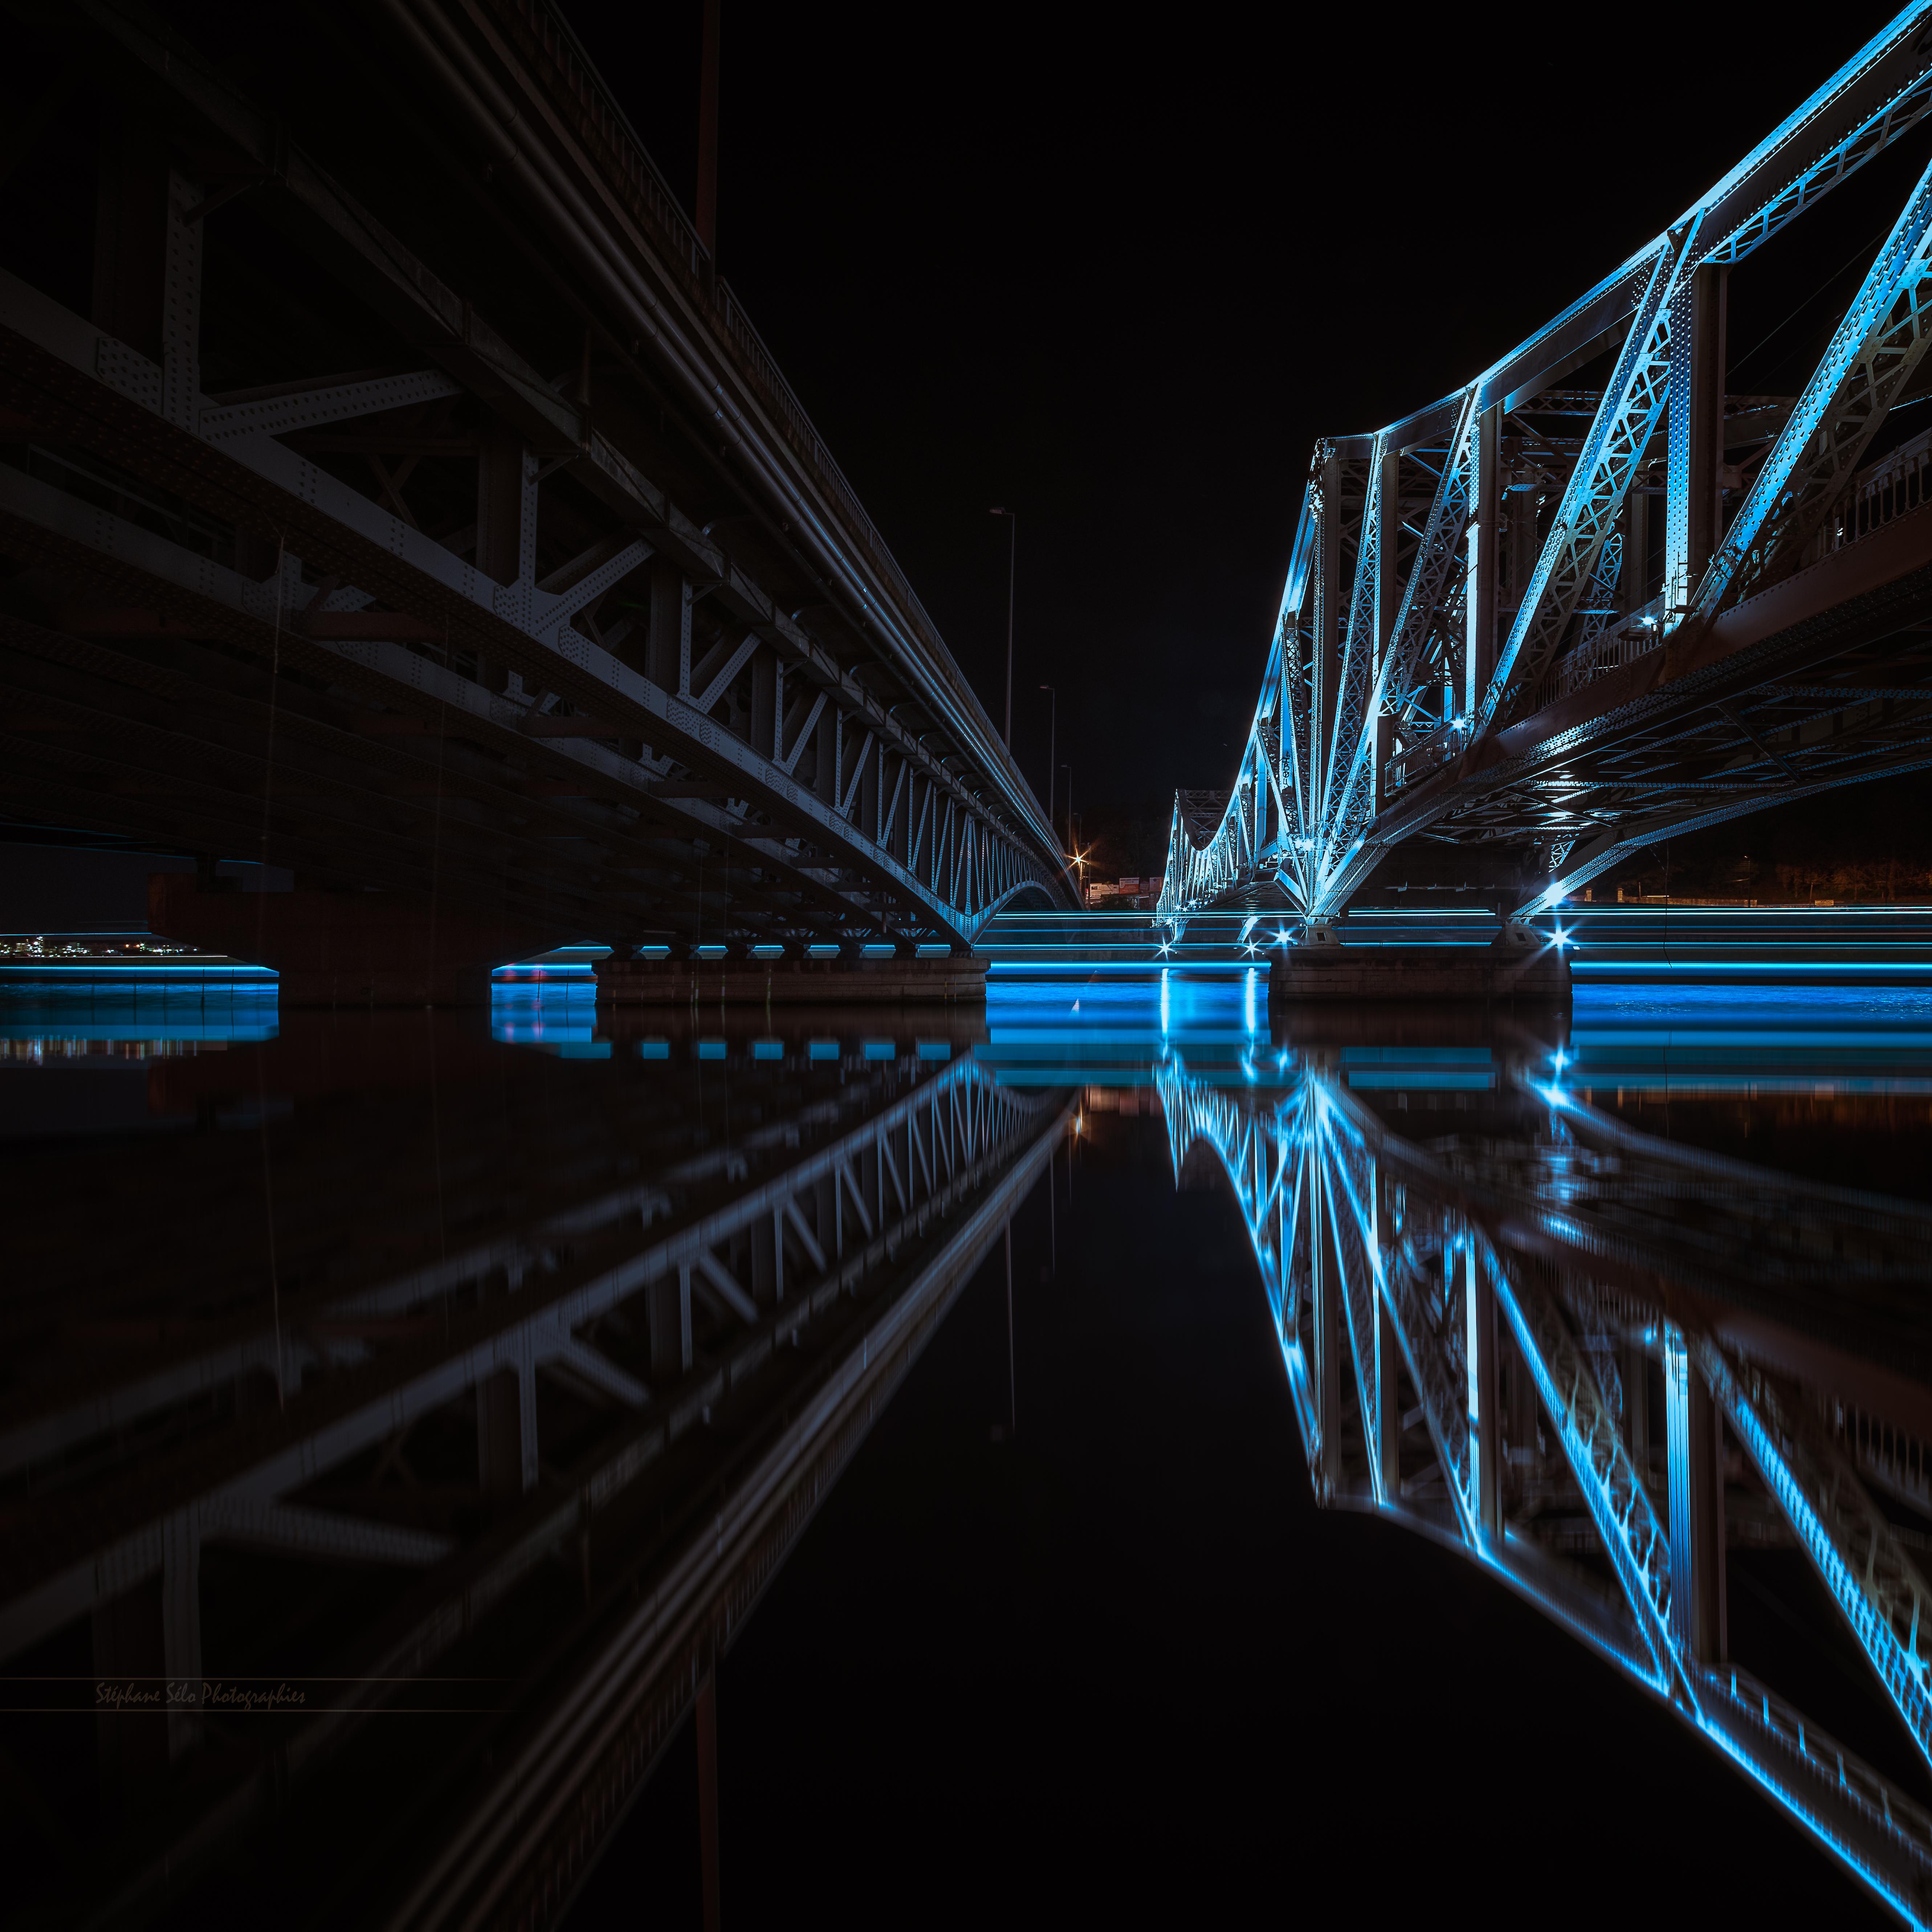 Ponts de la Mulatière